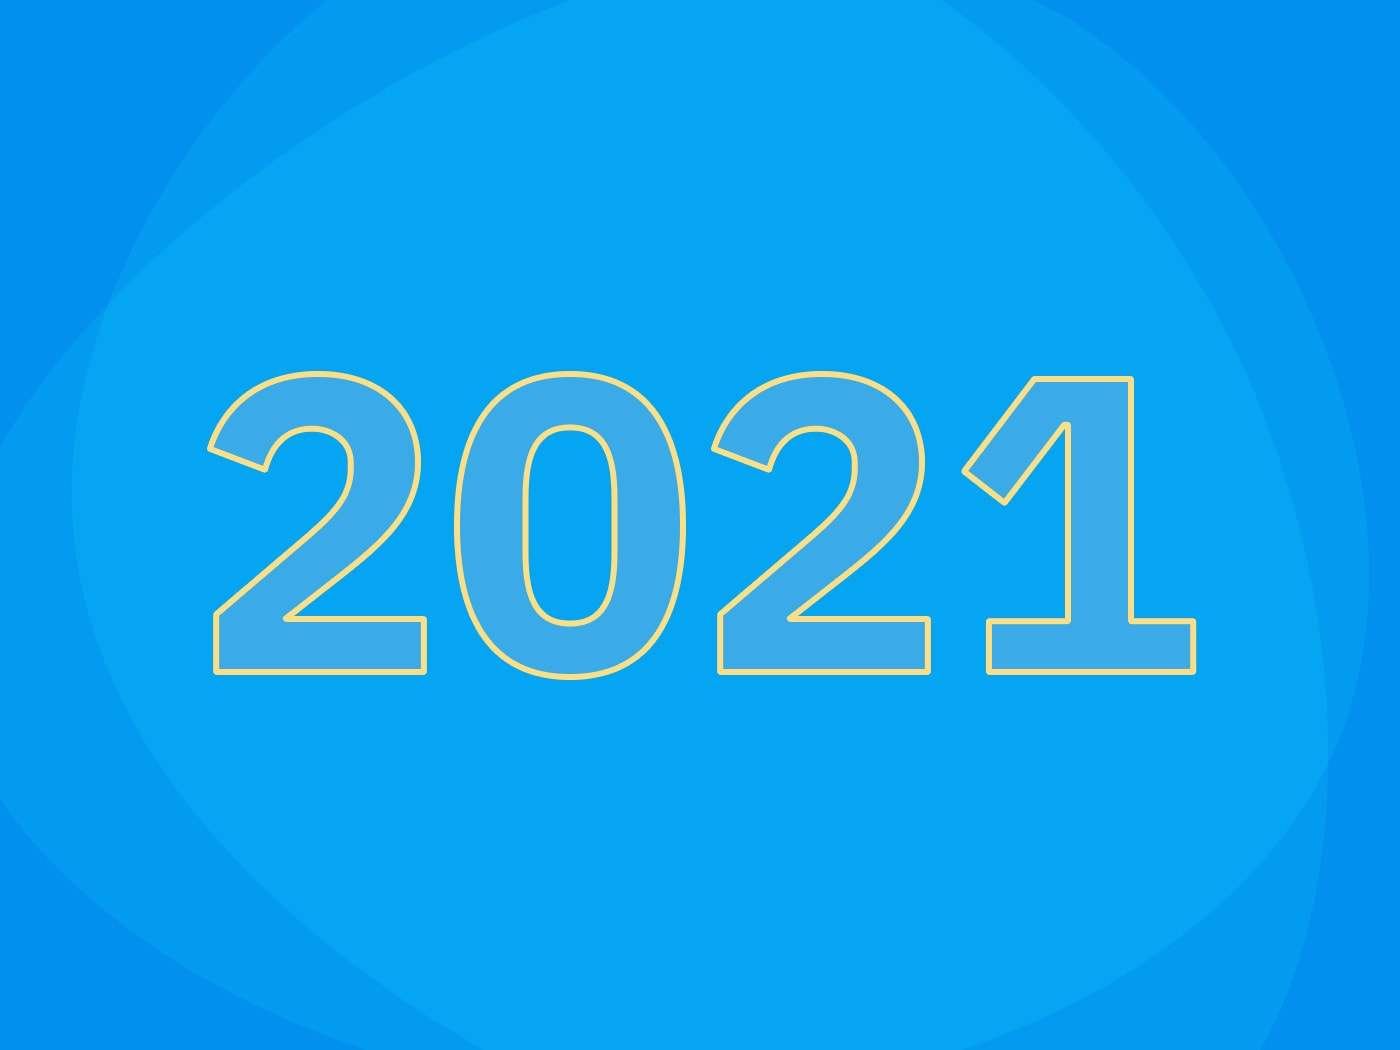 2021 for nonprofits